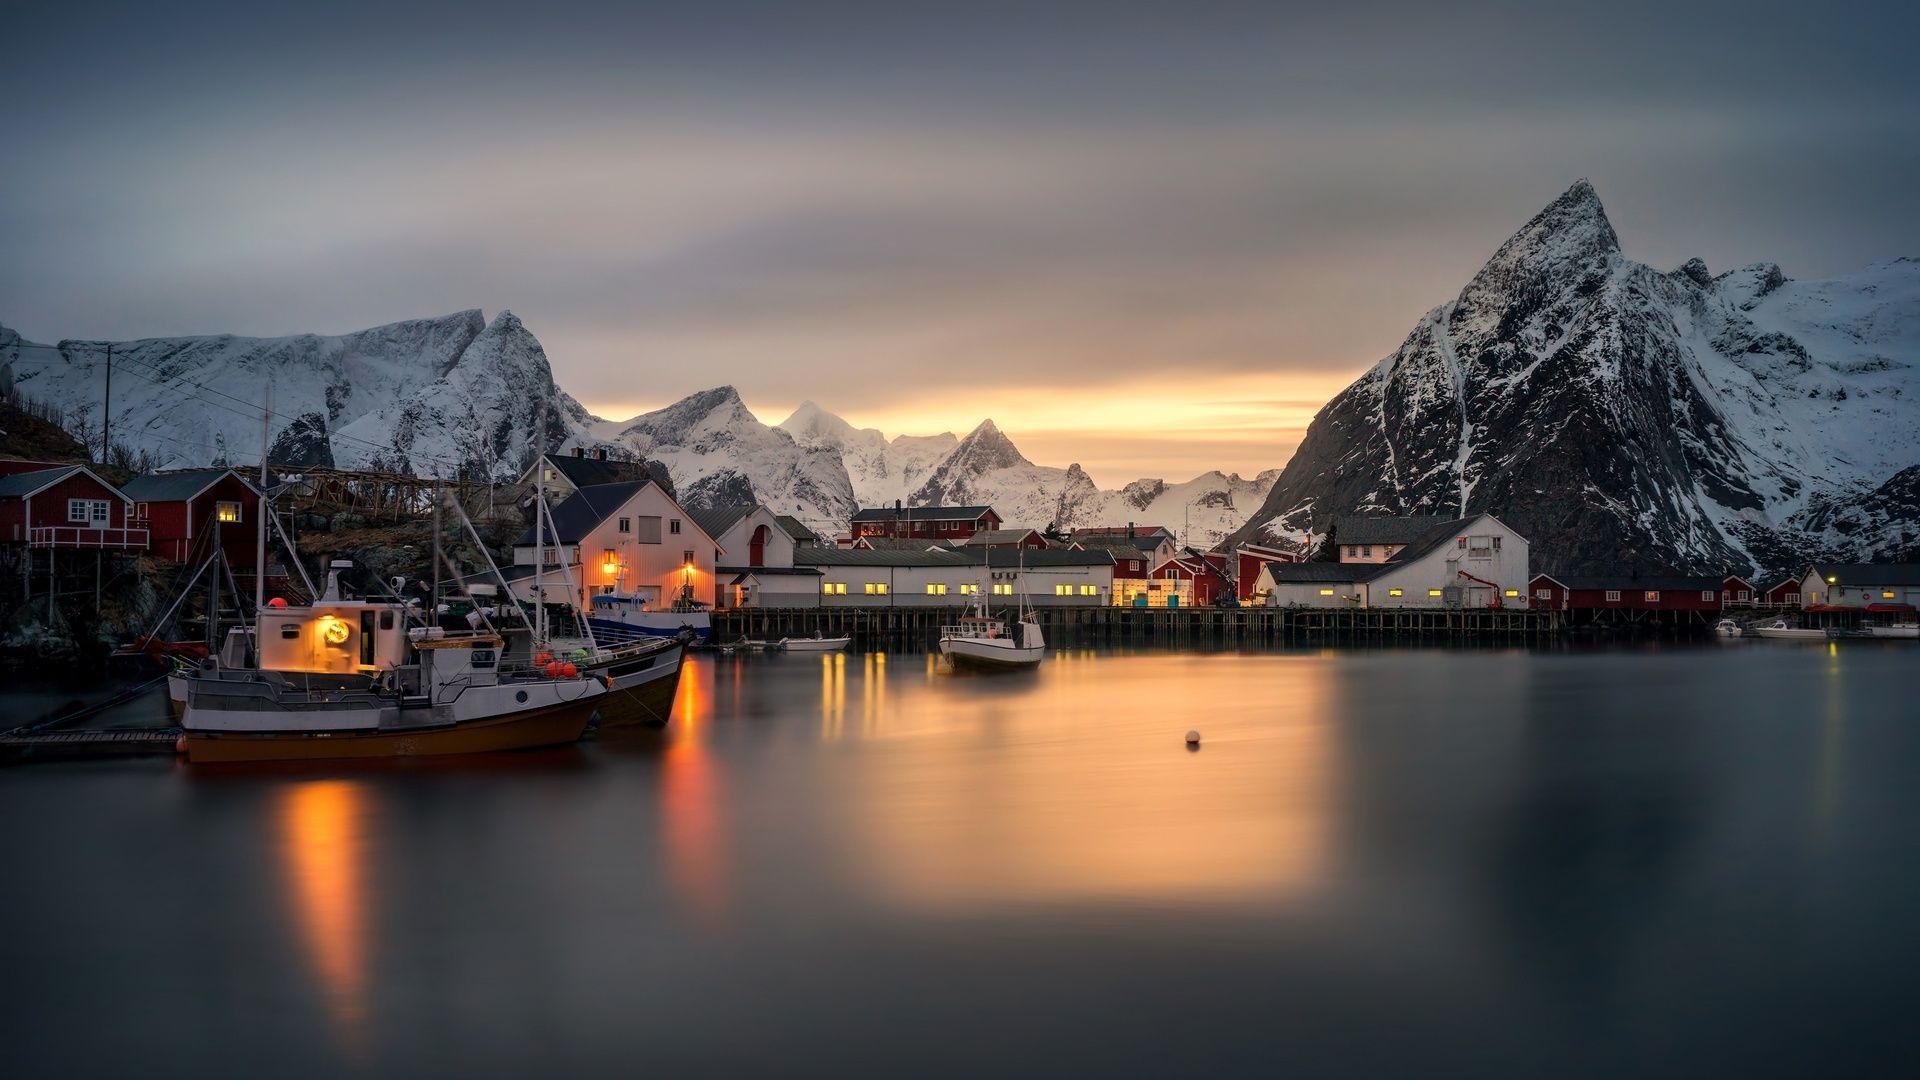 Обои побережье, причал, nice, лодки, дома. Города foto 19